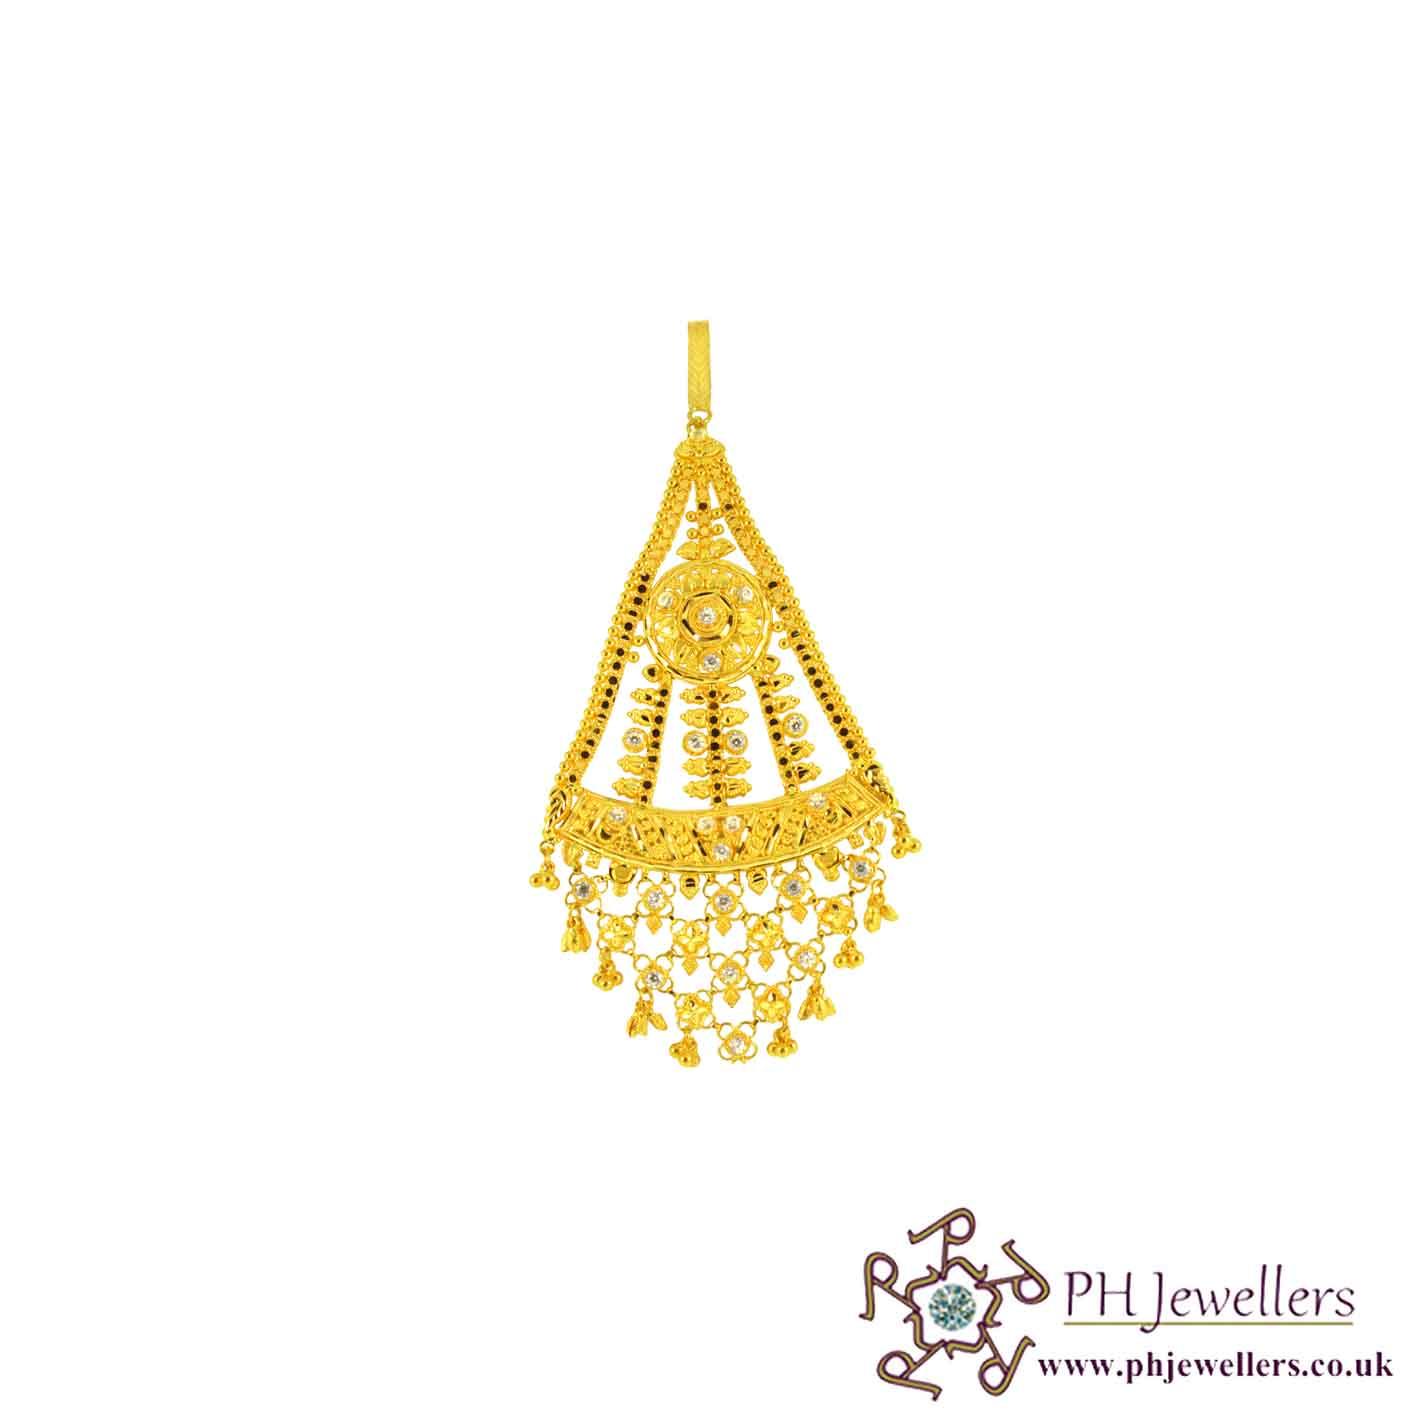 Online Gold Jewellery Gold Jewellery Jummer 22ct 916 Hallmark ...